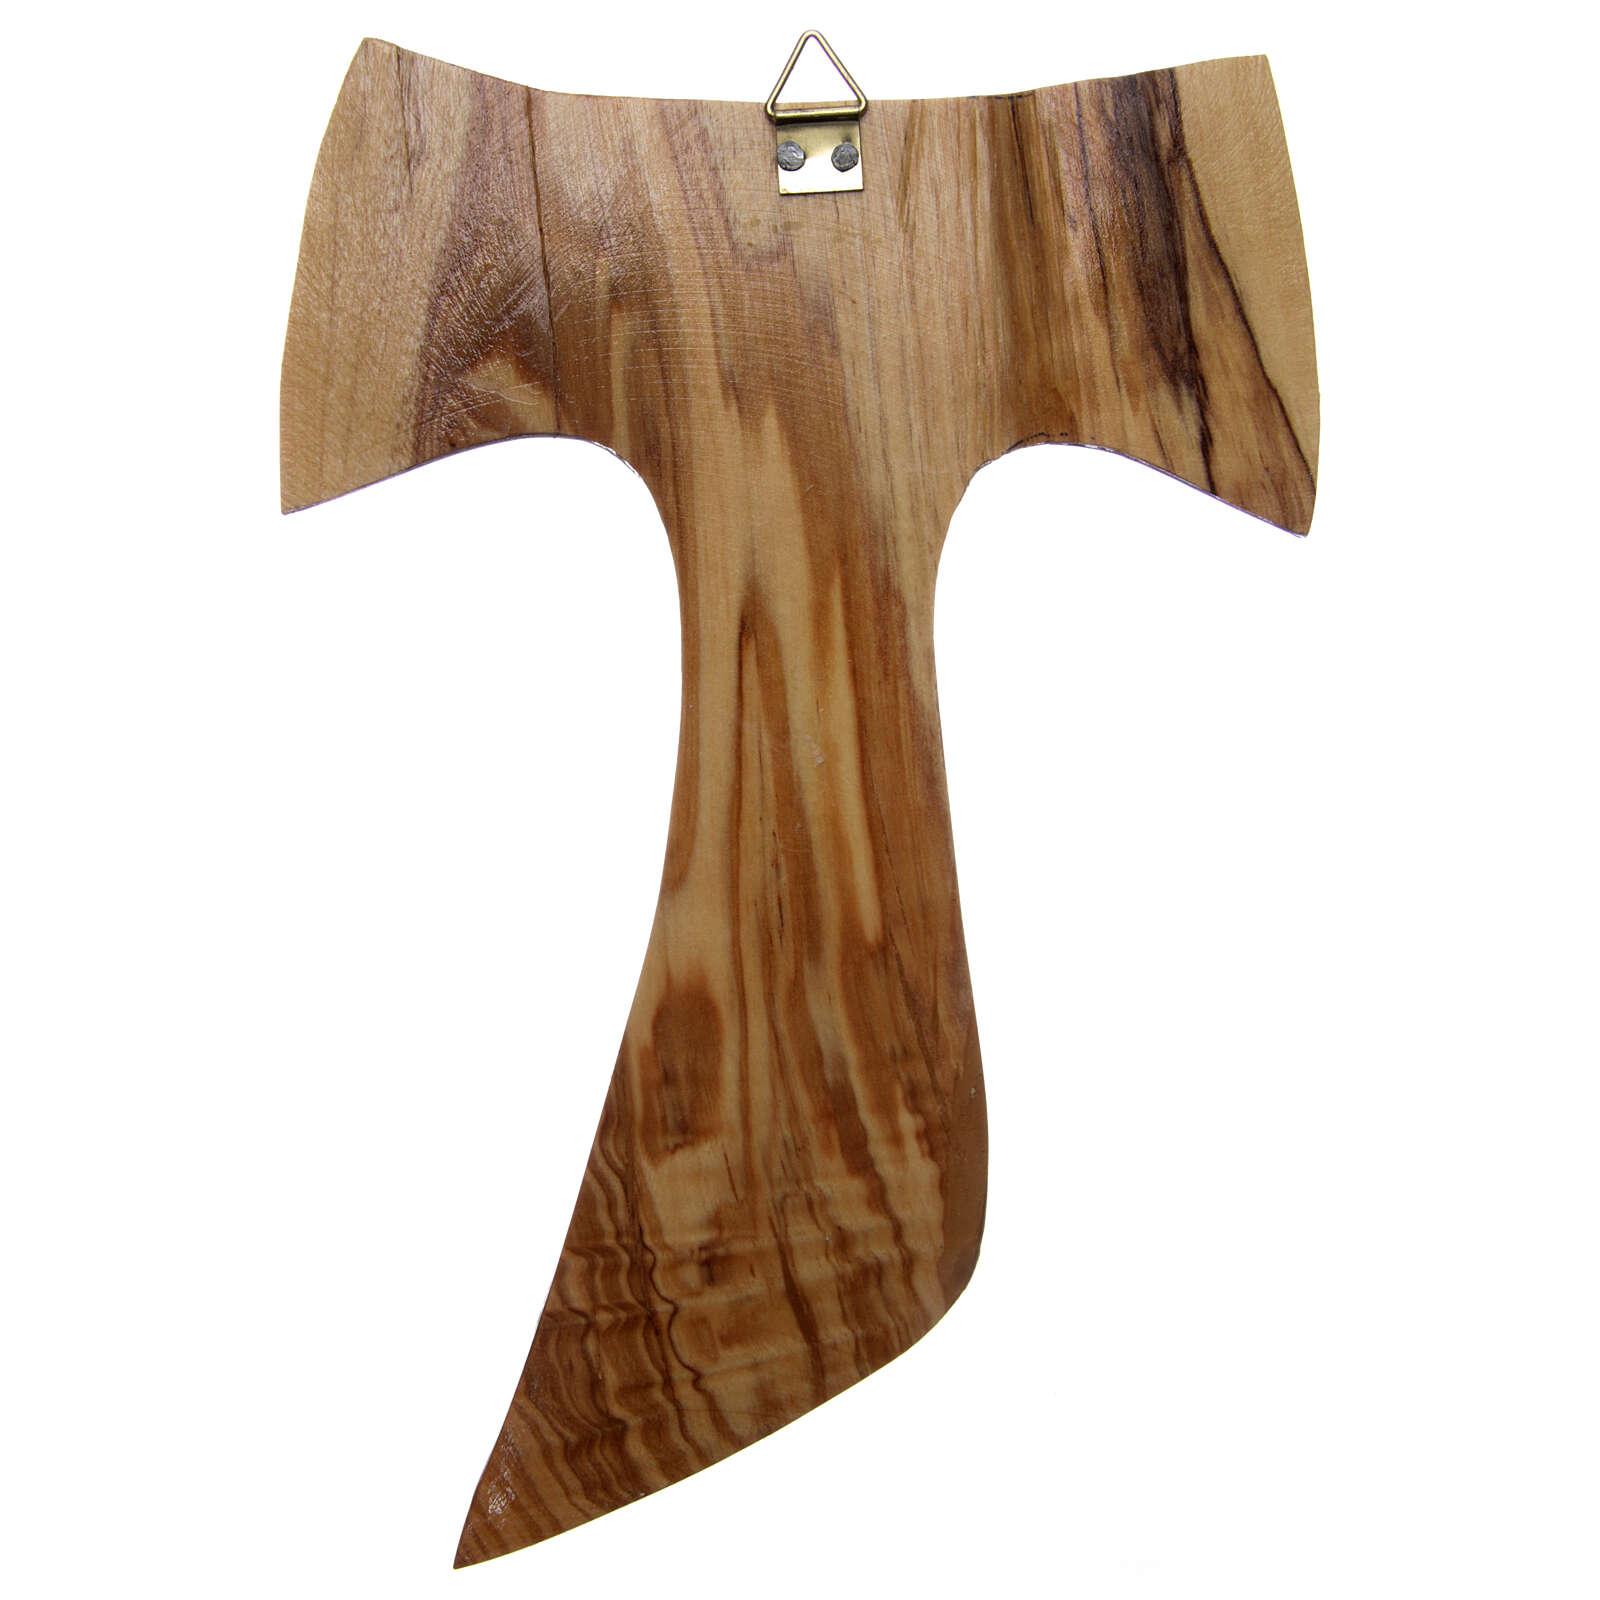 Cruz Tau oliveira Medjugorje 18x12 cm 4